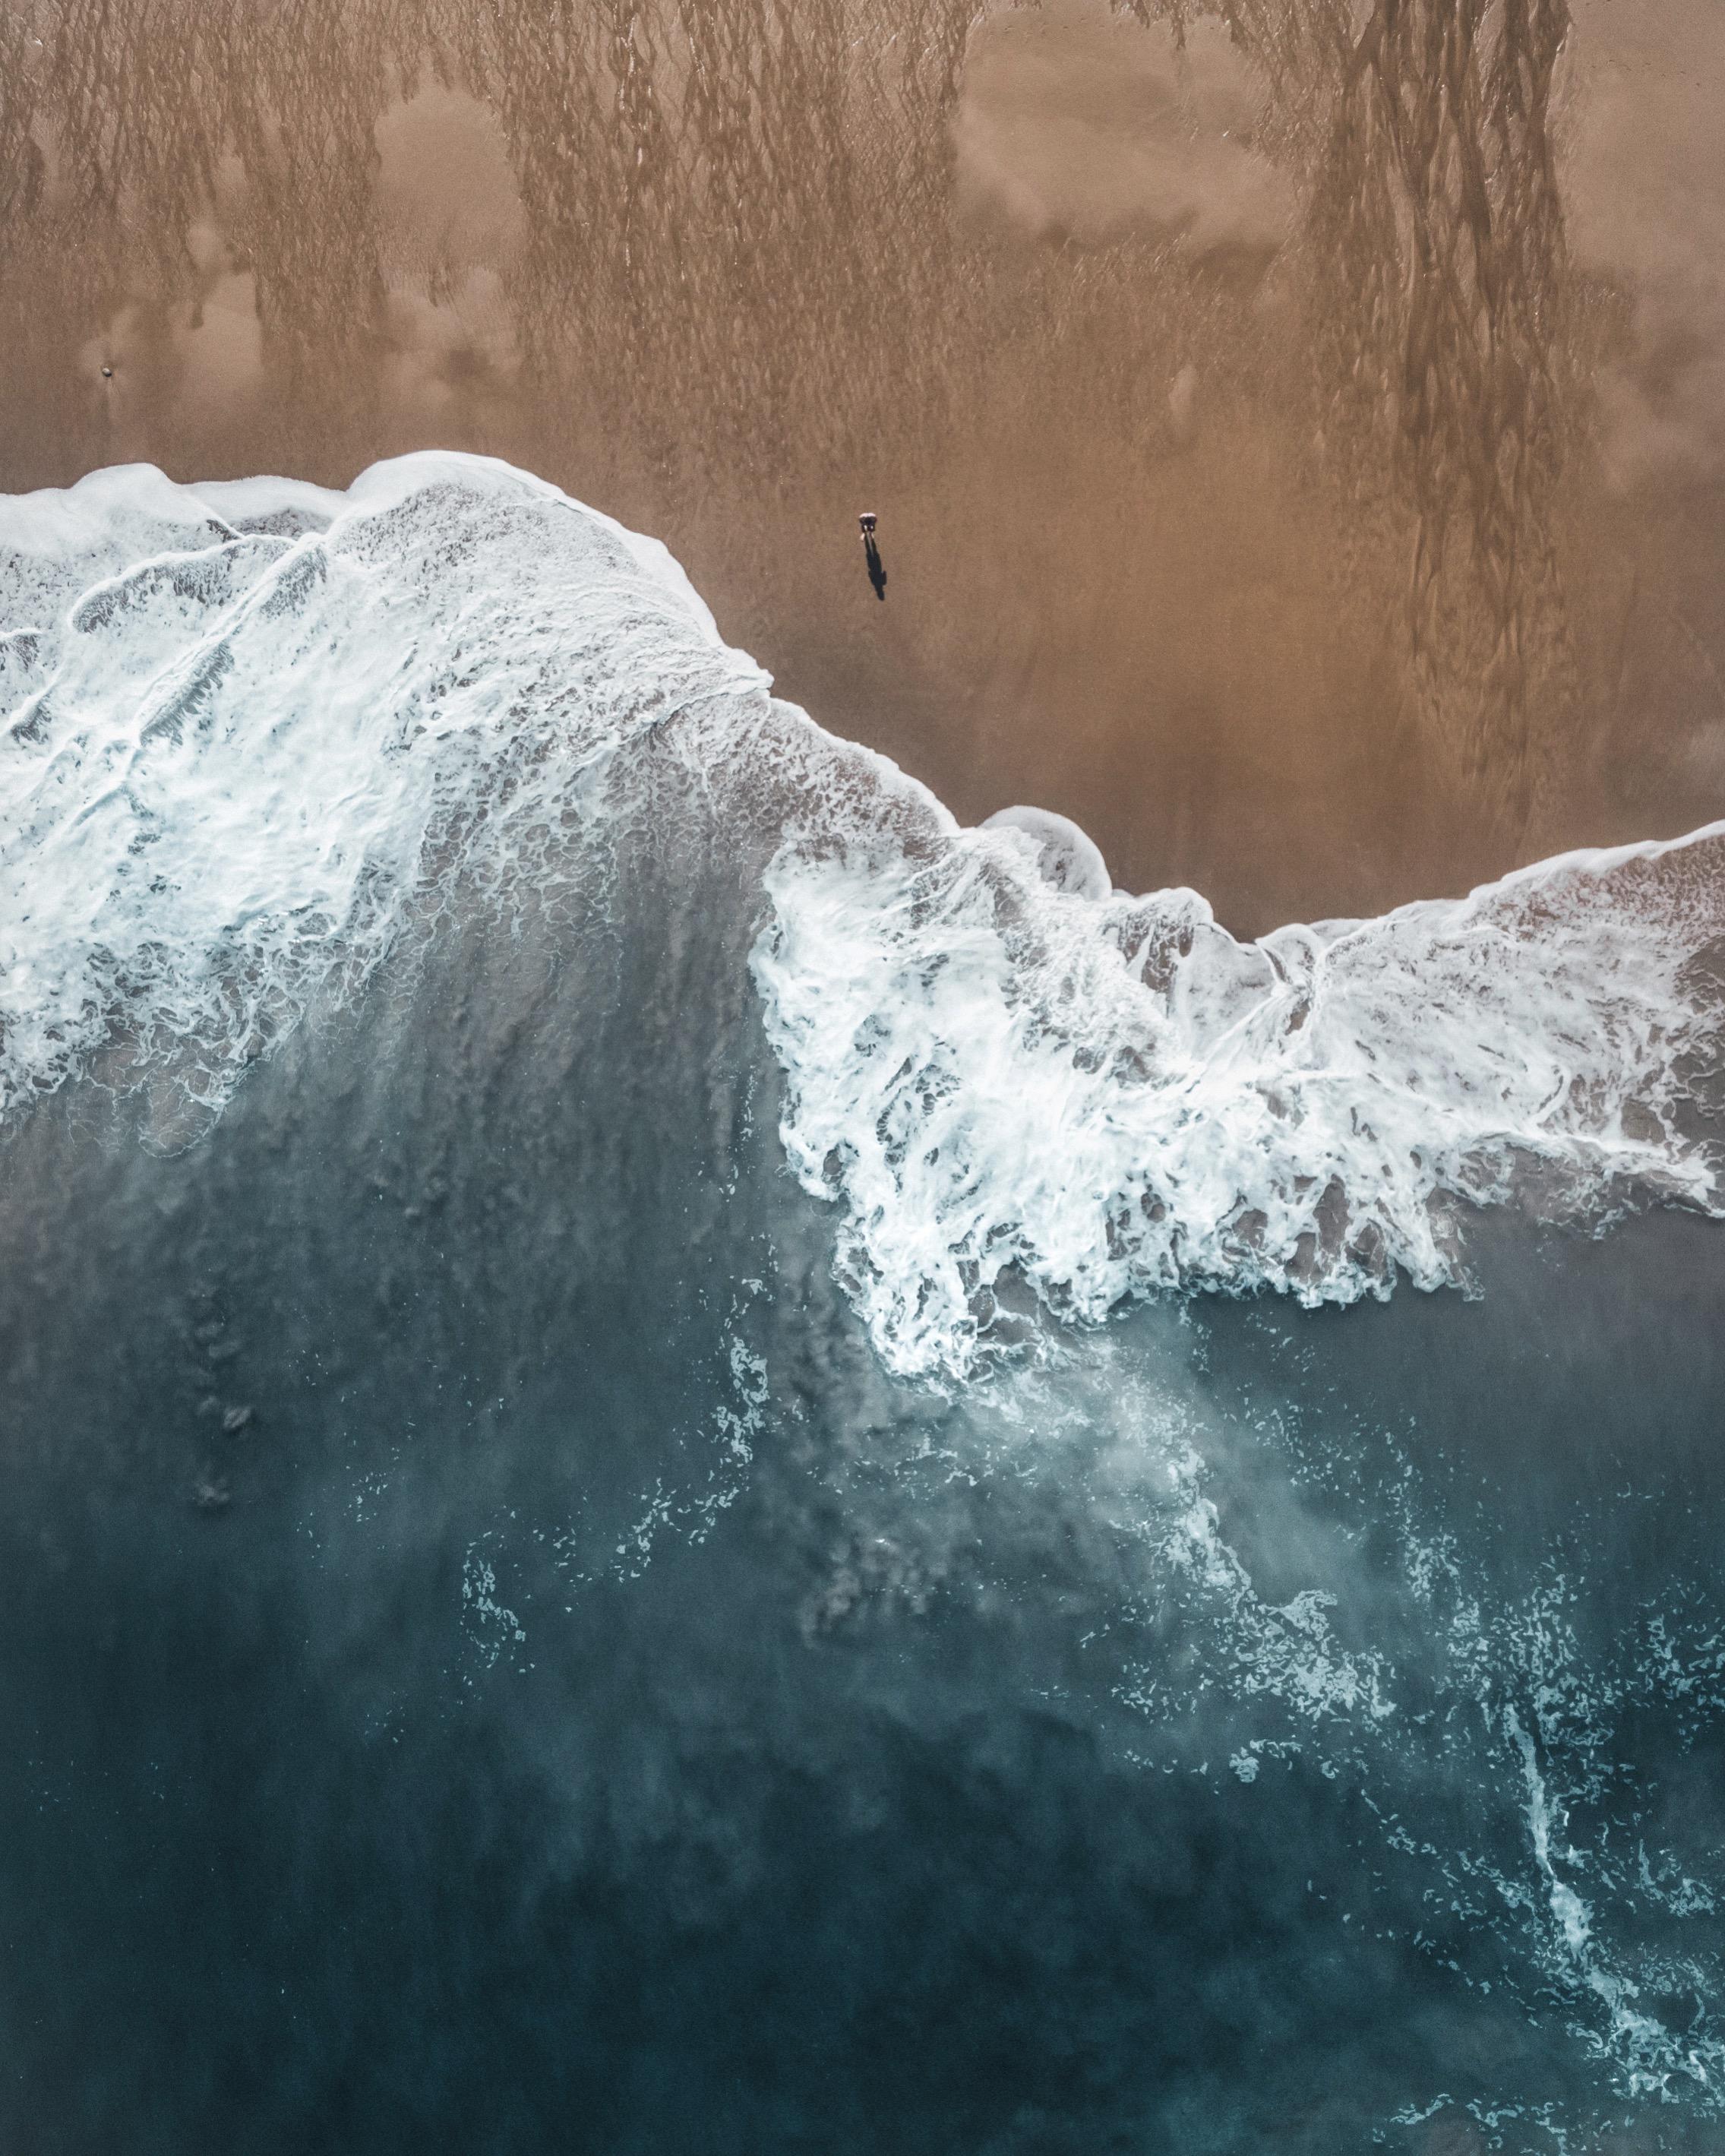 prestation drone Pau Béarn Pyrénées Pays Basque vue aériennes mer